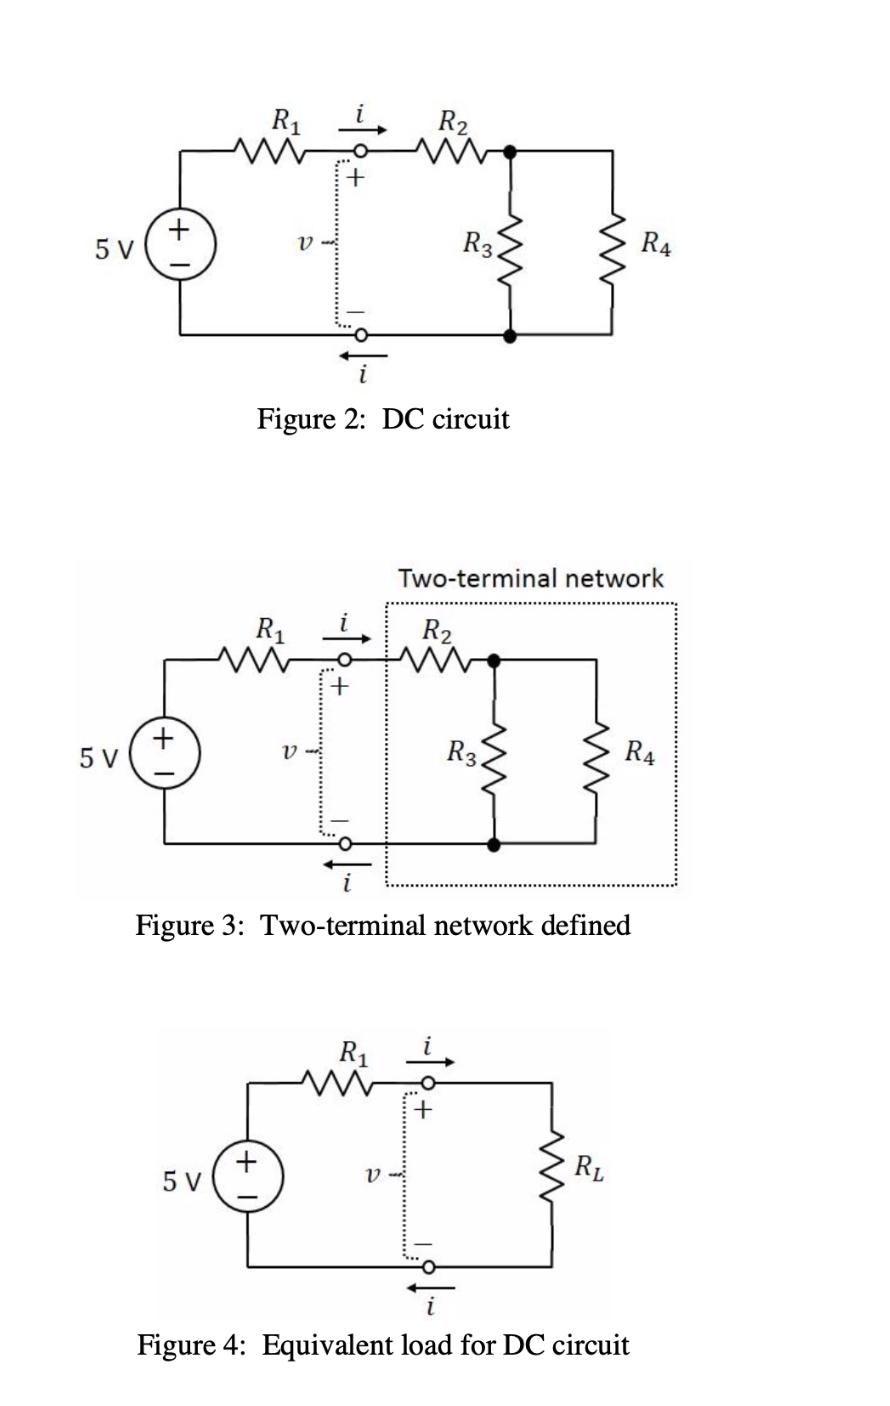 R2 R3 R4 V 5 V Figure 2: DC circuit Two-terminal network R2 R1 + 5 V R3 R4 V Figure 3: Two-terminal network defined R1 + + 5 V V Figure 4: Equivalent load for DC circuit w